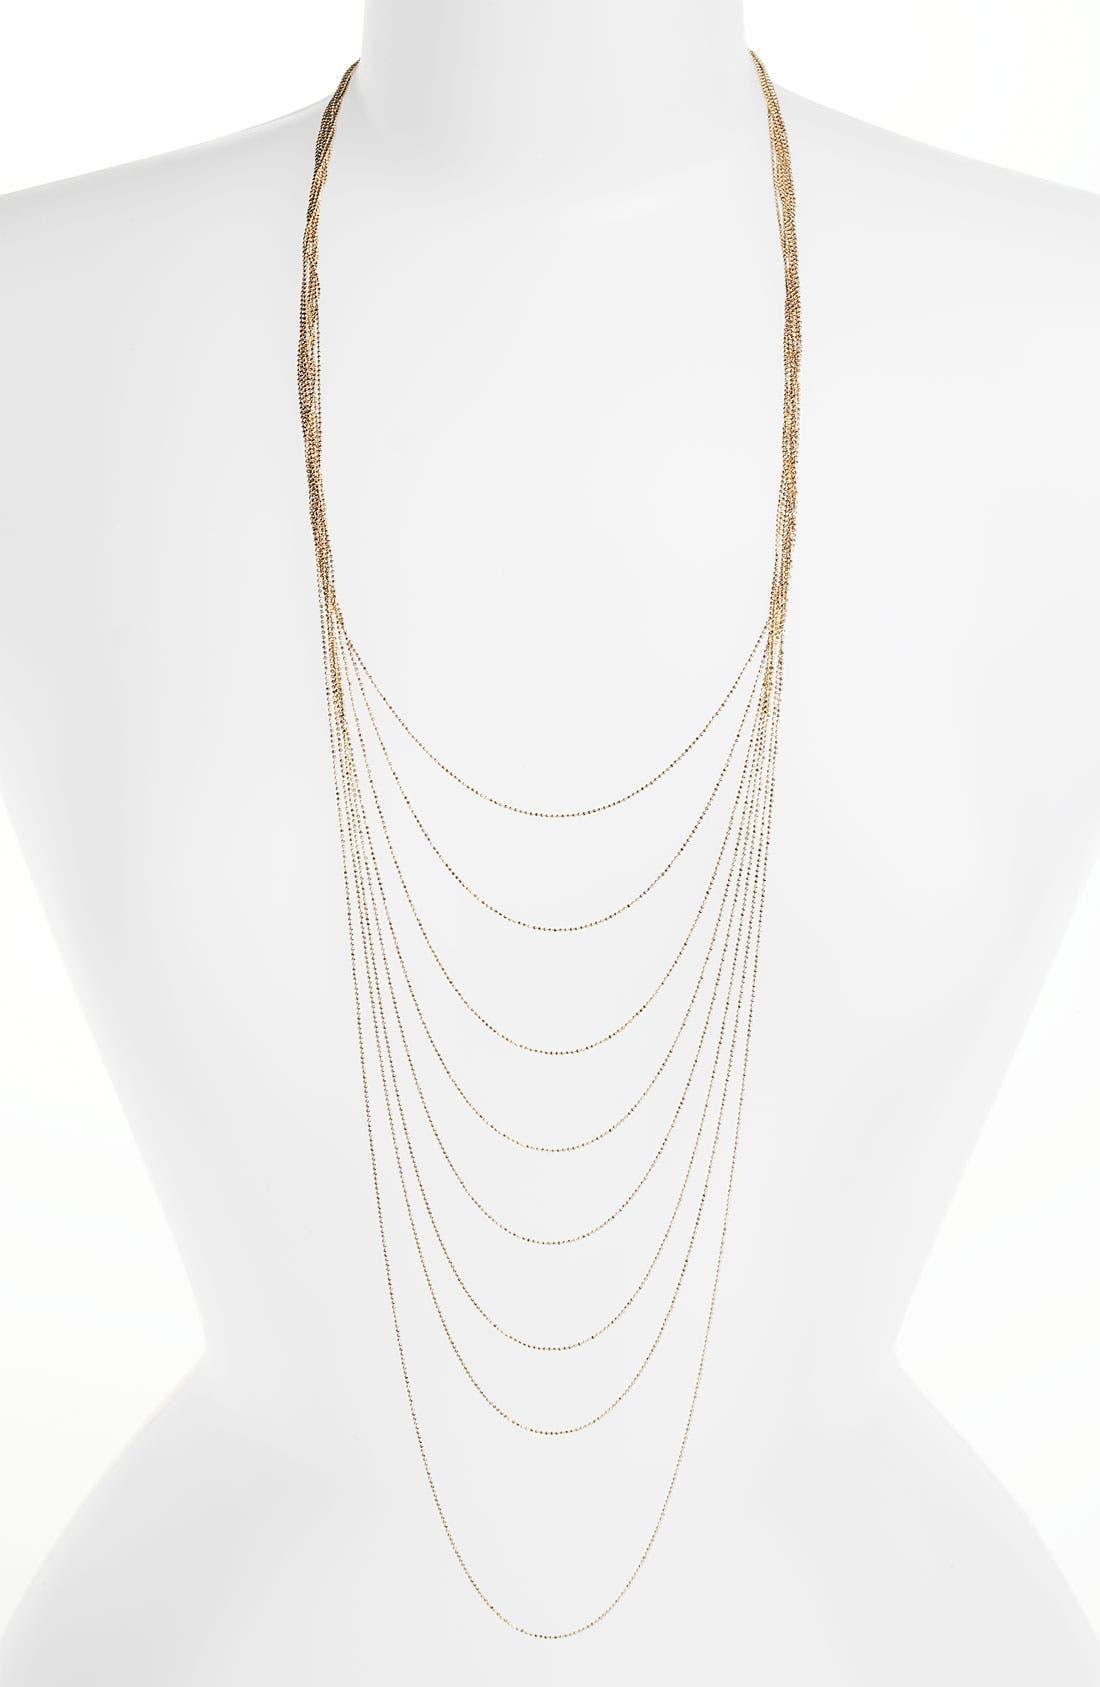 Main Image - Rachel Layered Chain Necklace